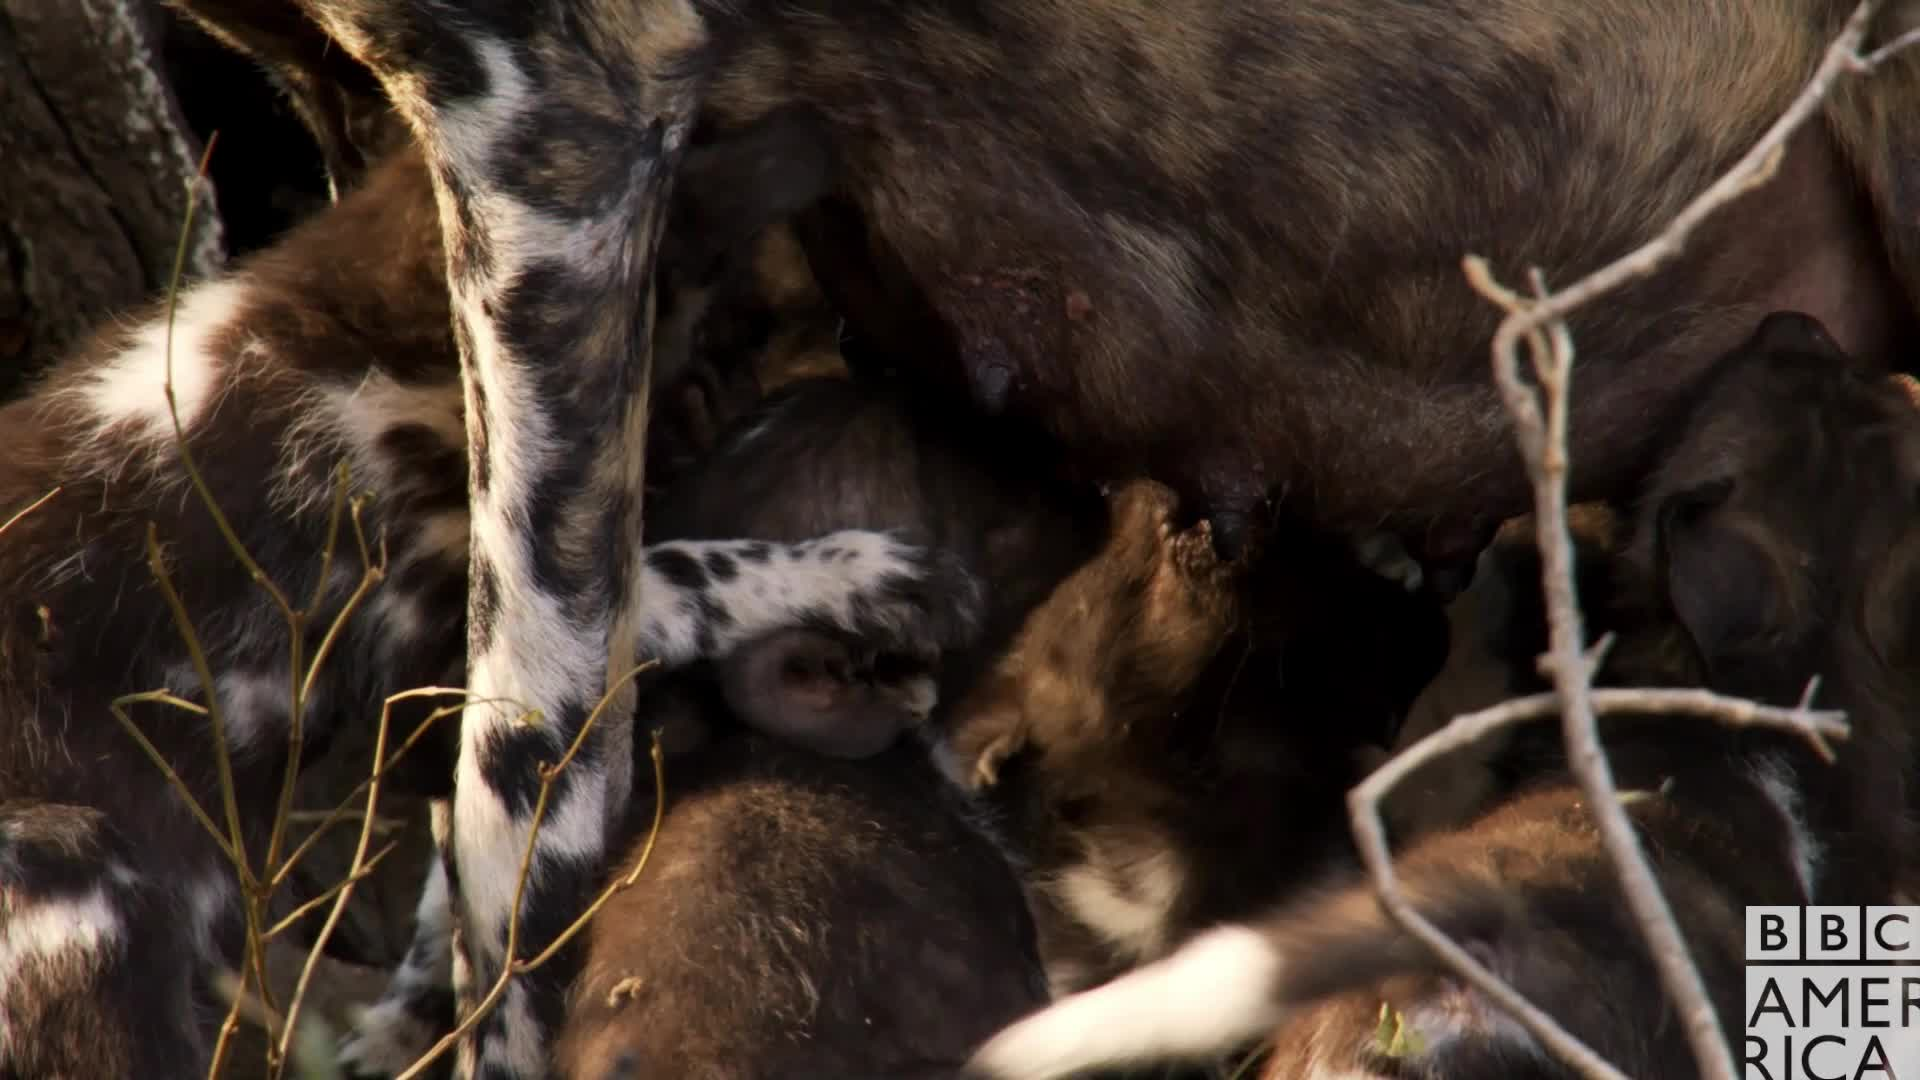 animal, animals, bbc america, bbc america dynasties, bbc america: dynasties, dynasties, painted wolf, painted wolves, thirsty, wolf, wolves, Dynasties Thirsty Wolf Puppies GIFs